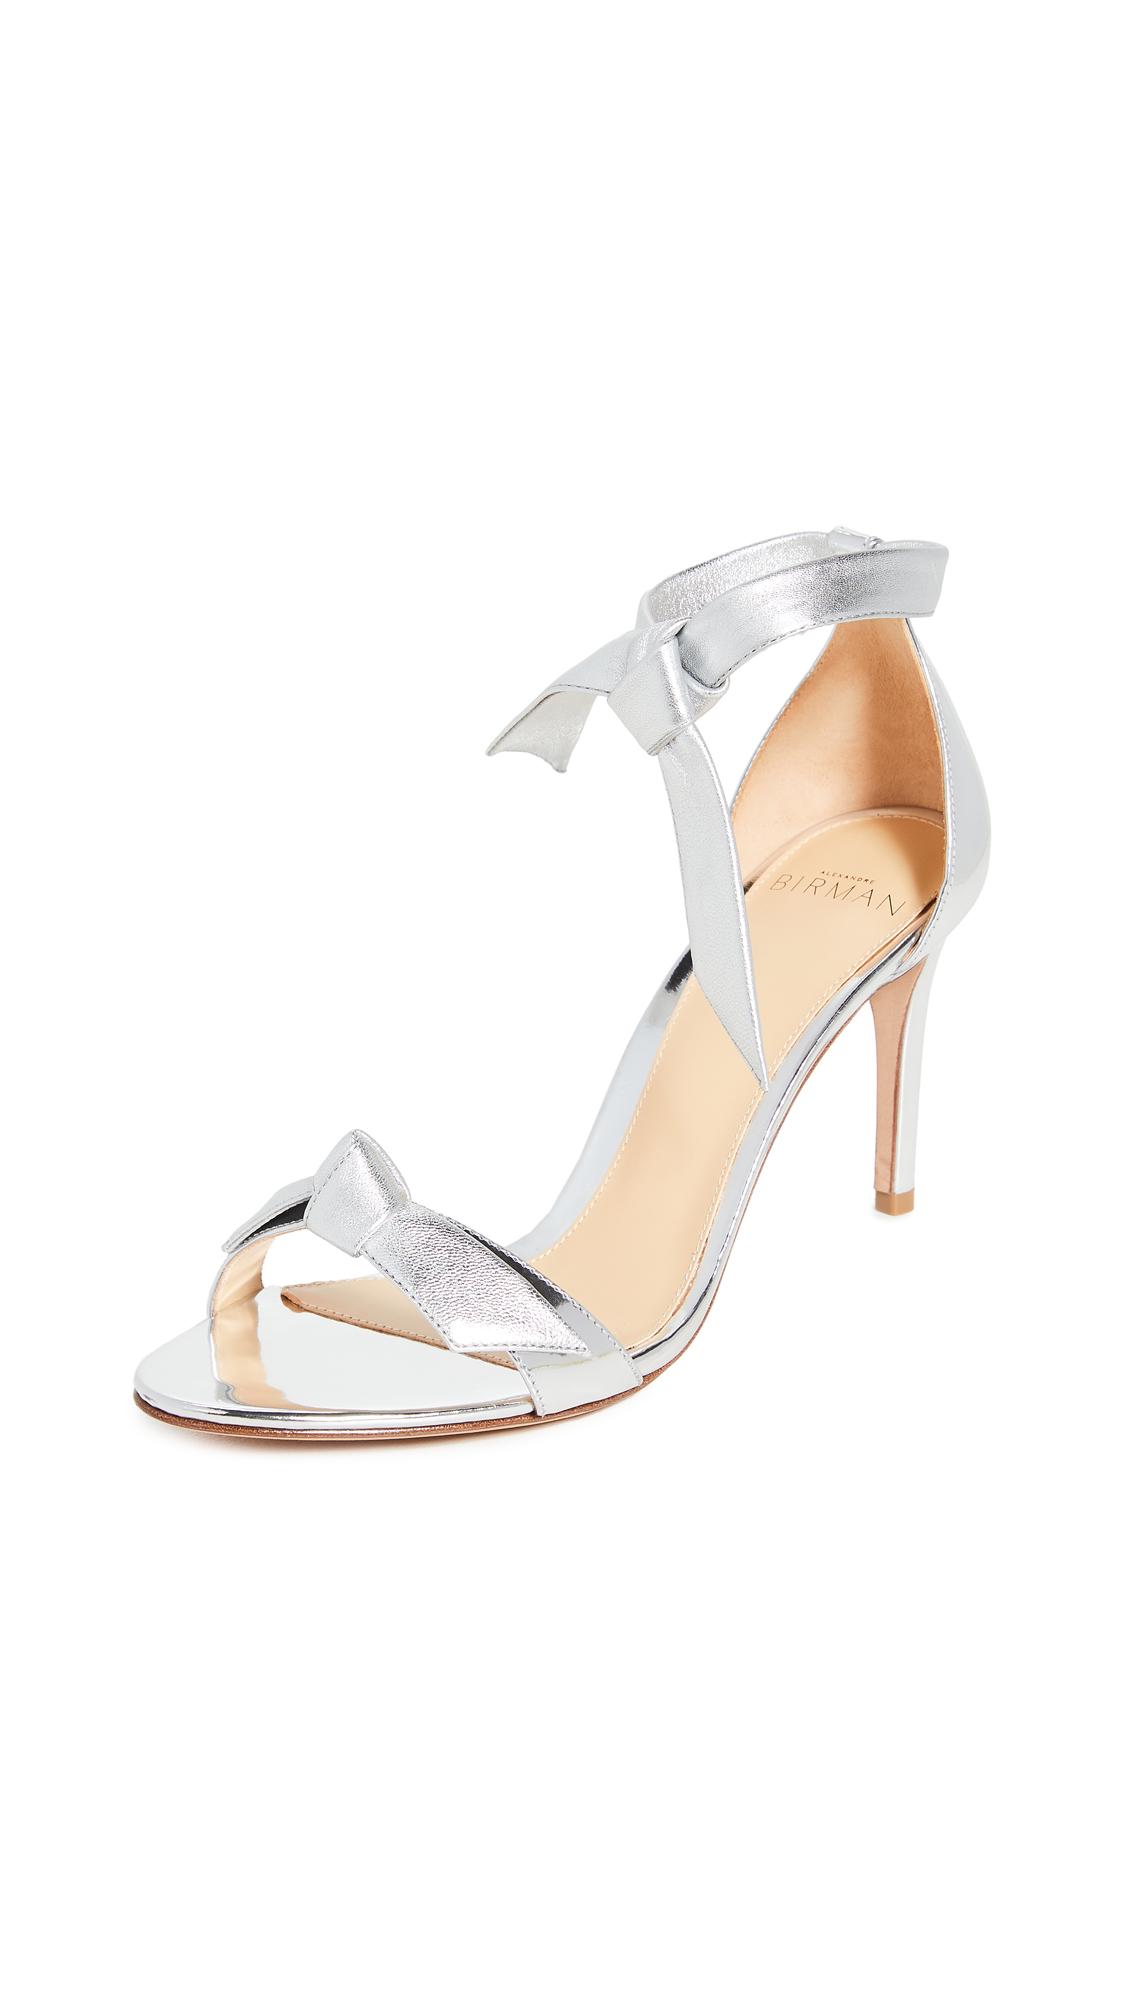 Alexandre Birman Clarita Metallic Sandals 85mm - 50% Off Sale